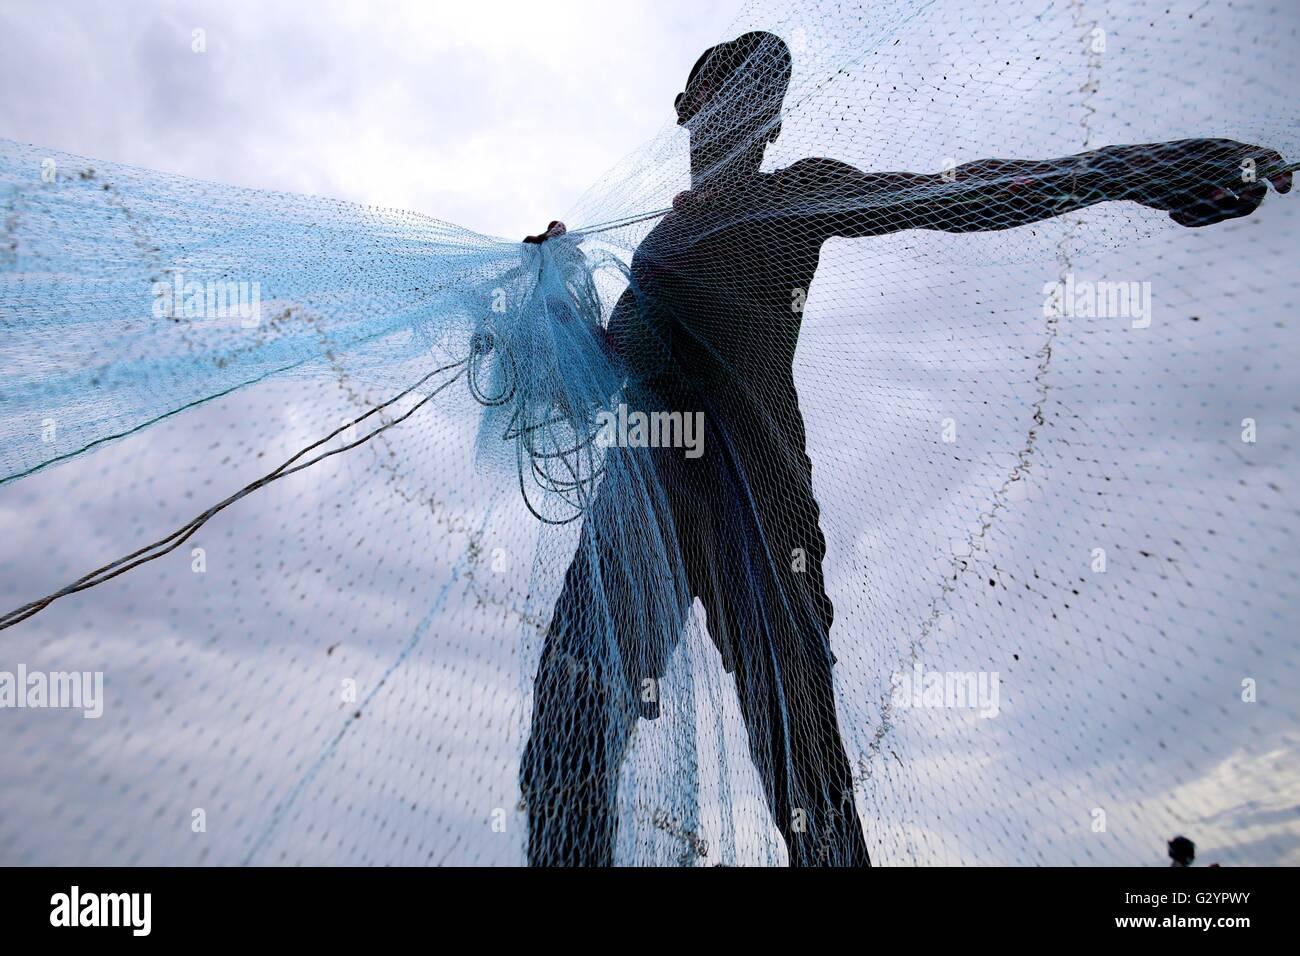 Kyaukphyu, Myanmar. 5th June, 2016. A fisherman prepares his fishing net at the Kyaukphyu beach in Rakhine State, - Stock Image